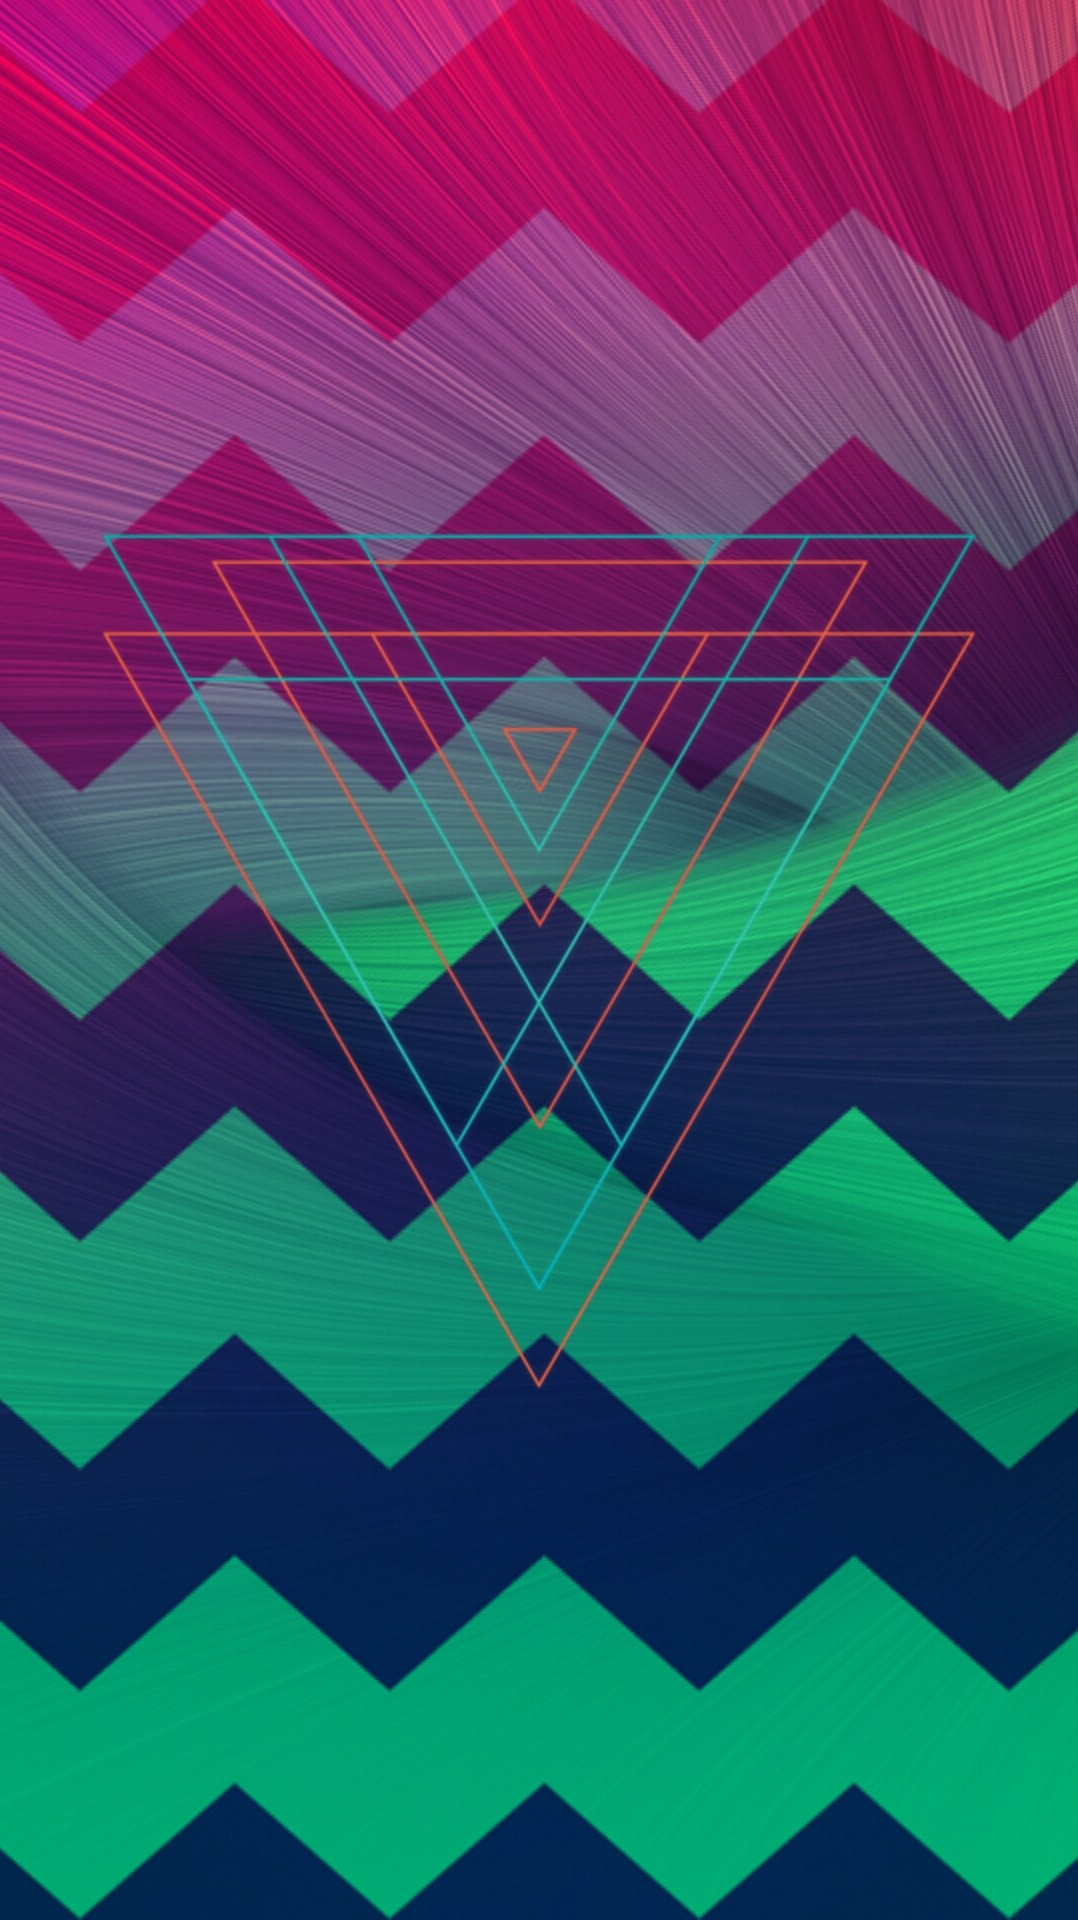 Triangle Art Wallpaper iPhone Wallpaper iphoneswallpapers com